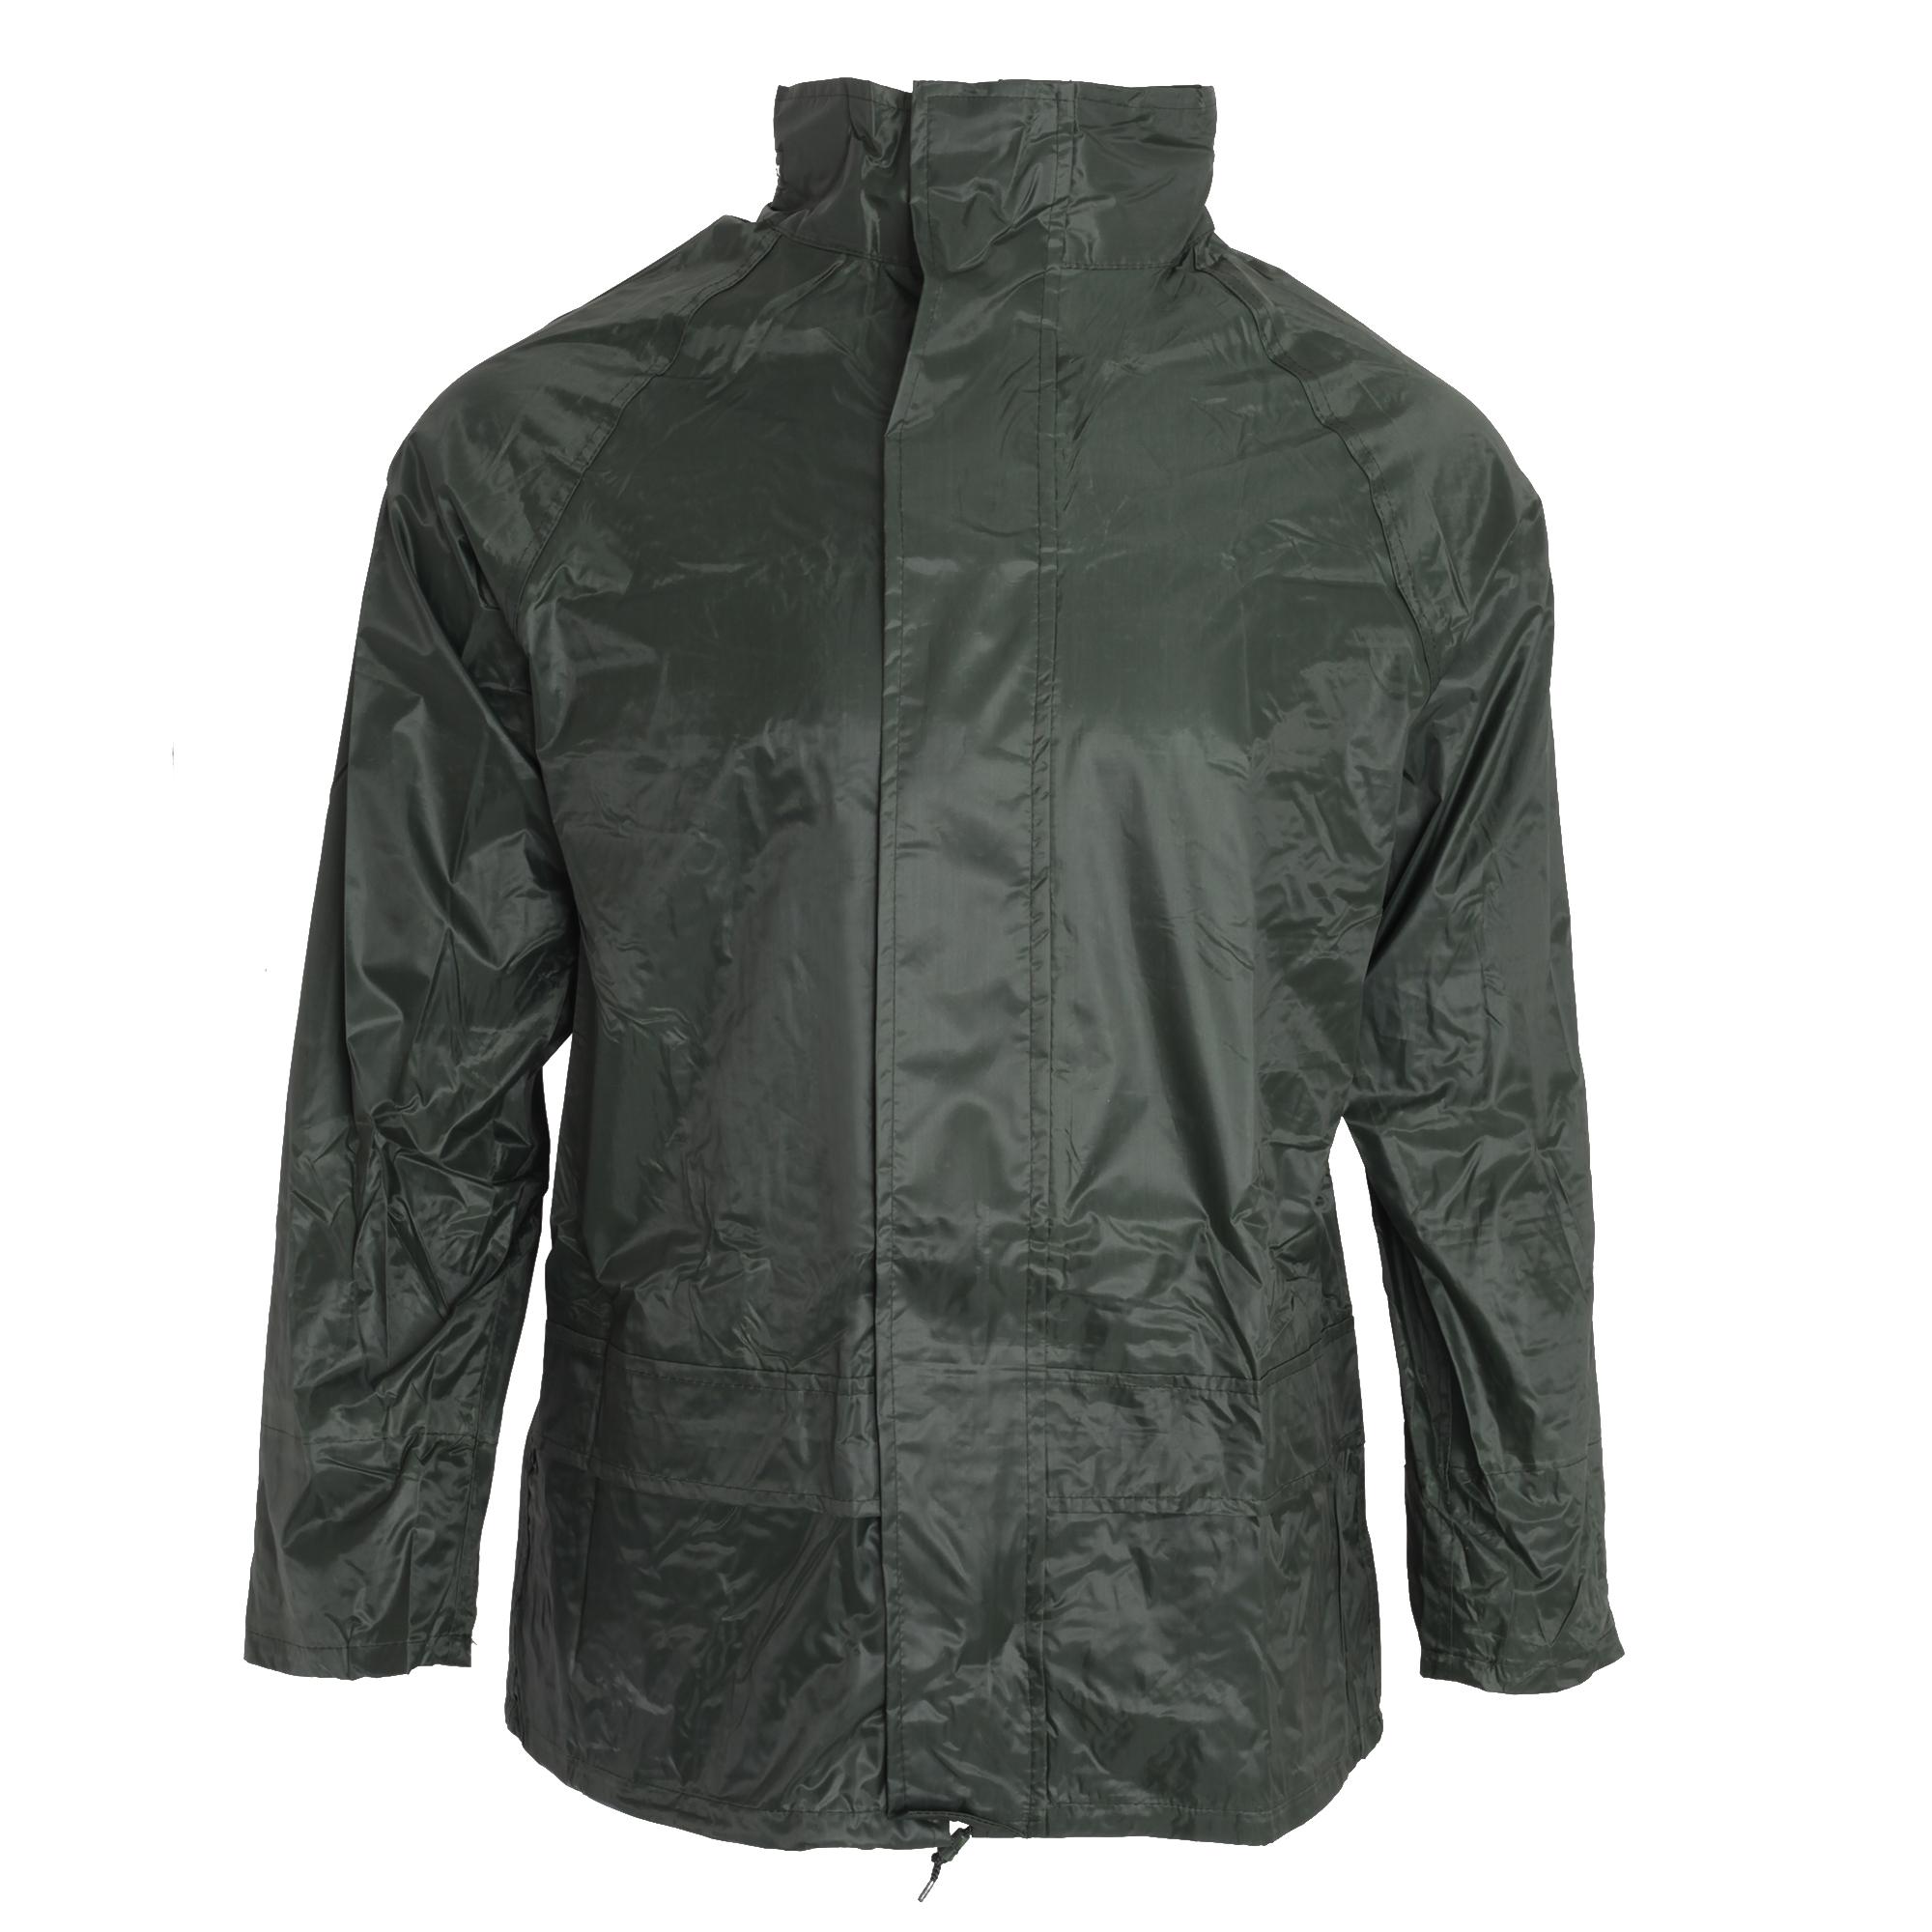 Arctic Storm Mens Lightweight Jacket (L) (Olive)